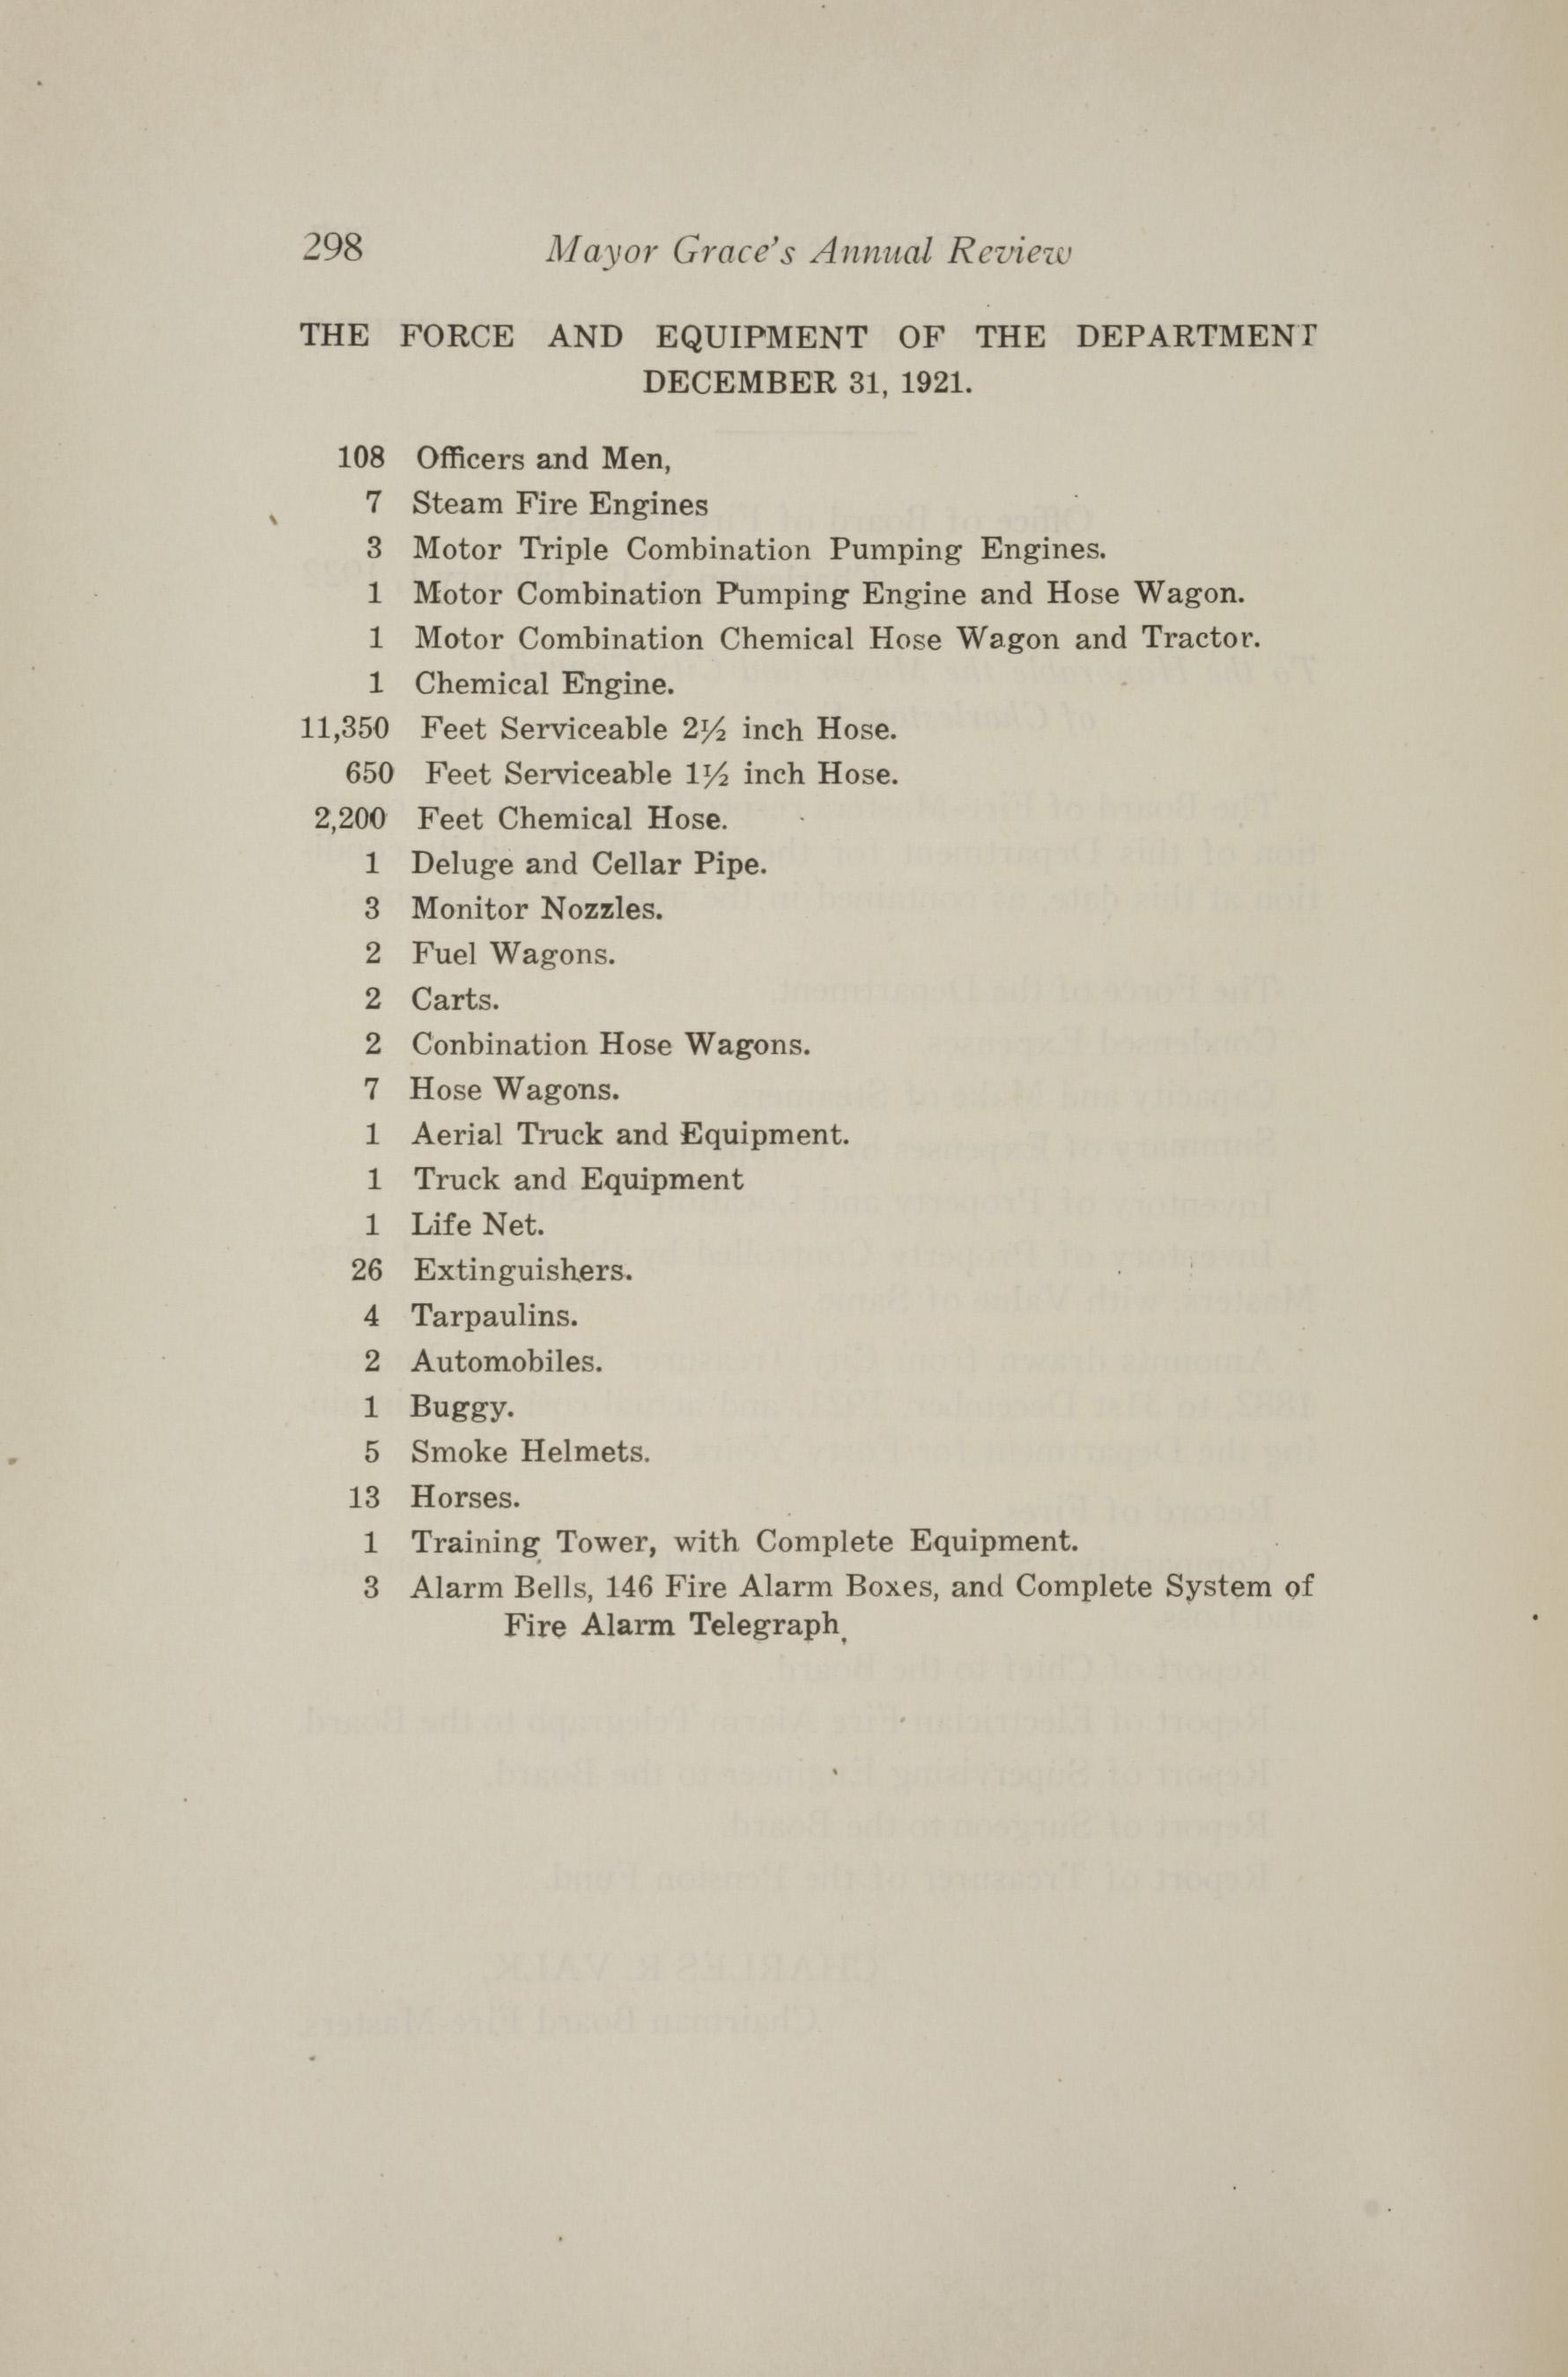 Charleston Yearbook, 1921, page 298